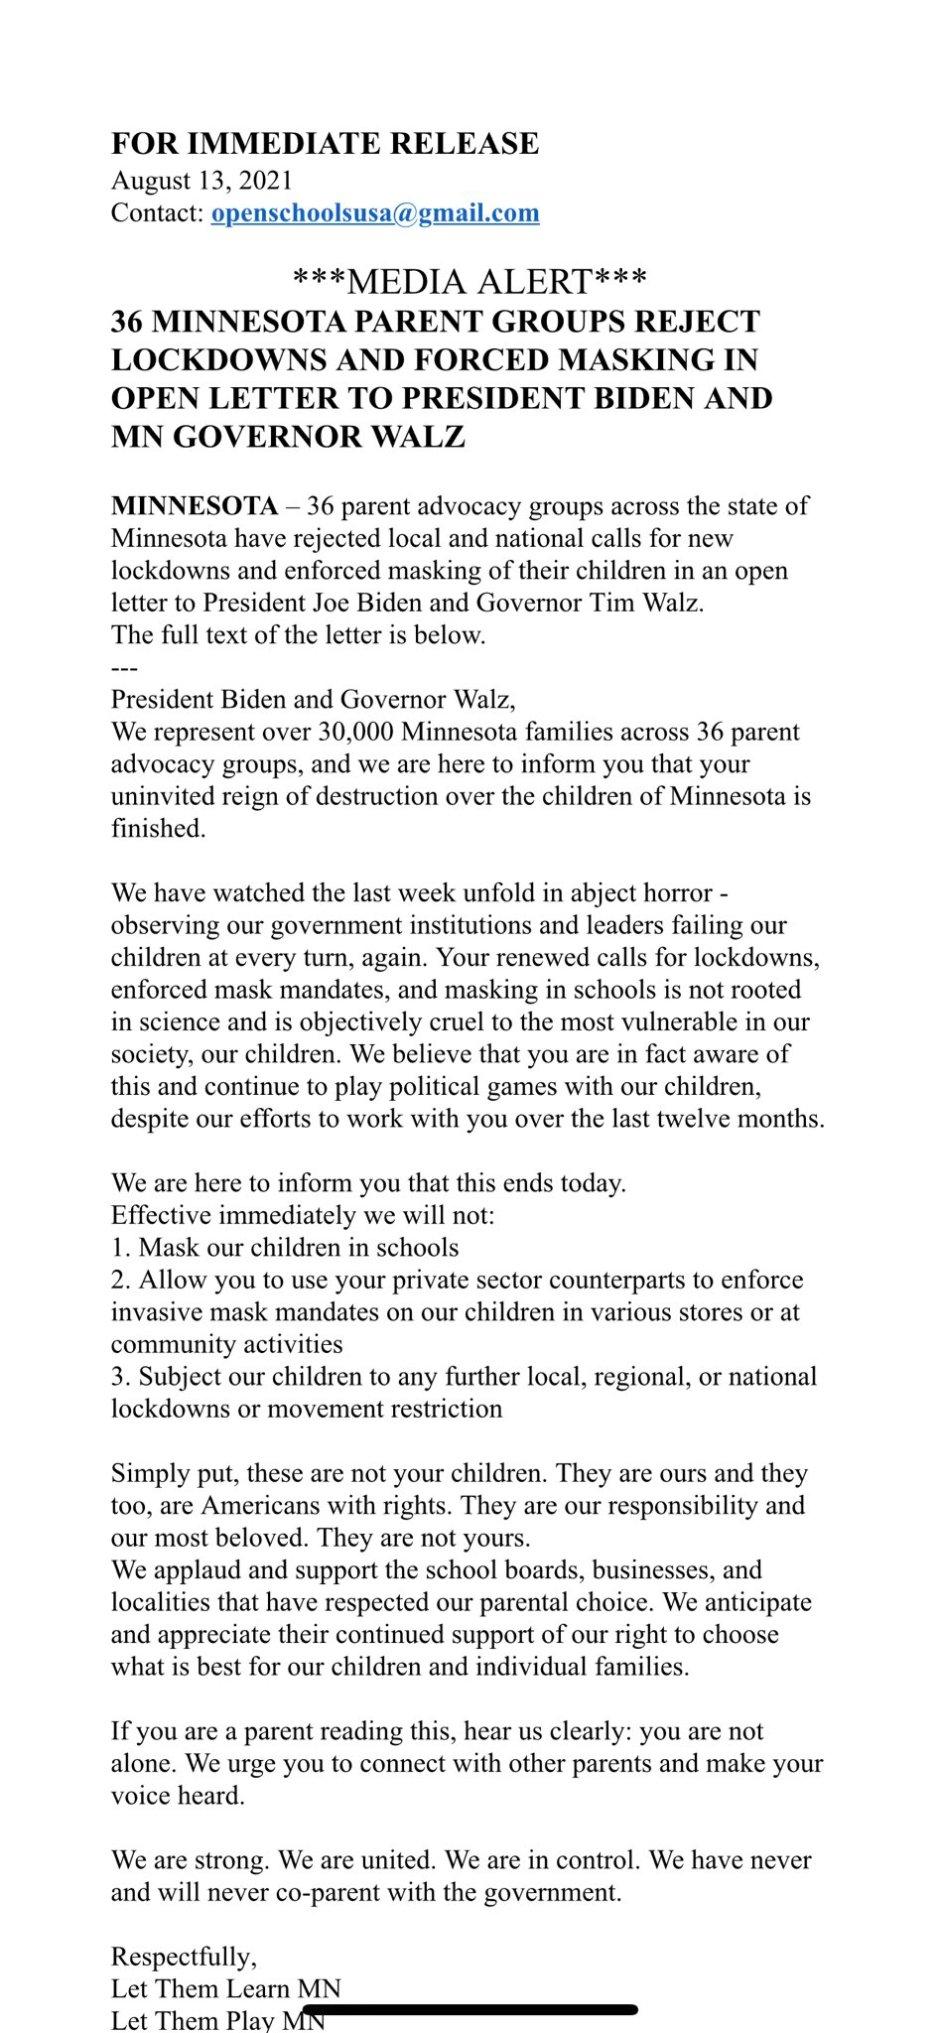 Minnesota parents refuse lockdowns and mask mandates for school children. Parents oppose DemocratGovernor Tim Walz'slatest mask mandates.